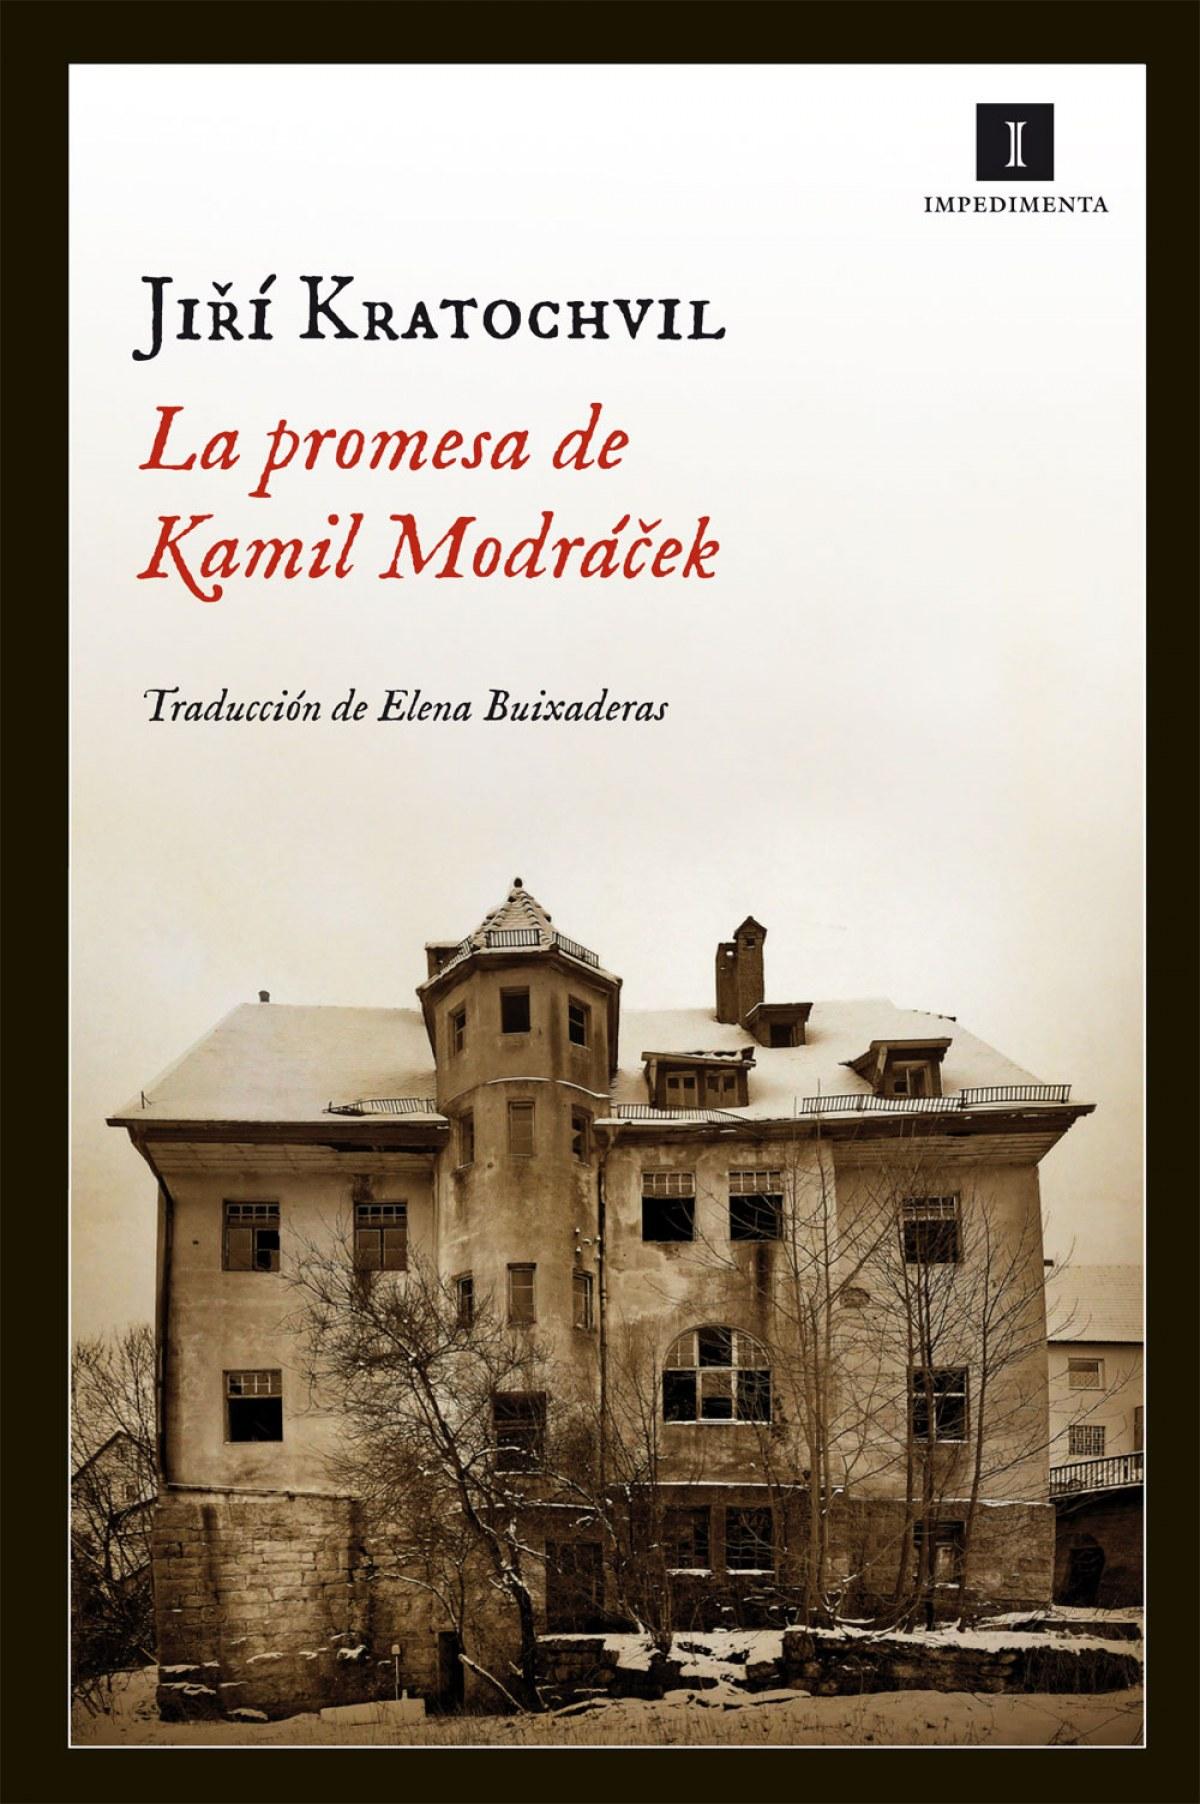 La promesa de Kamil Modrácek 9788415130420